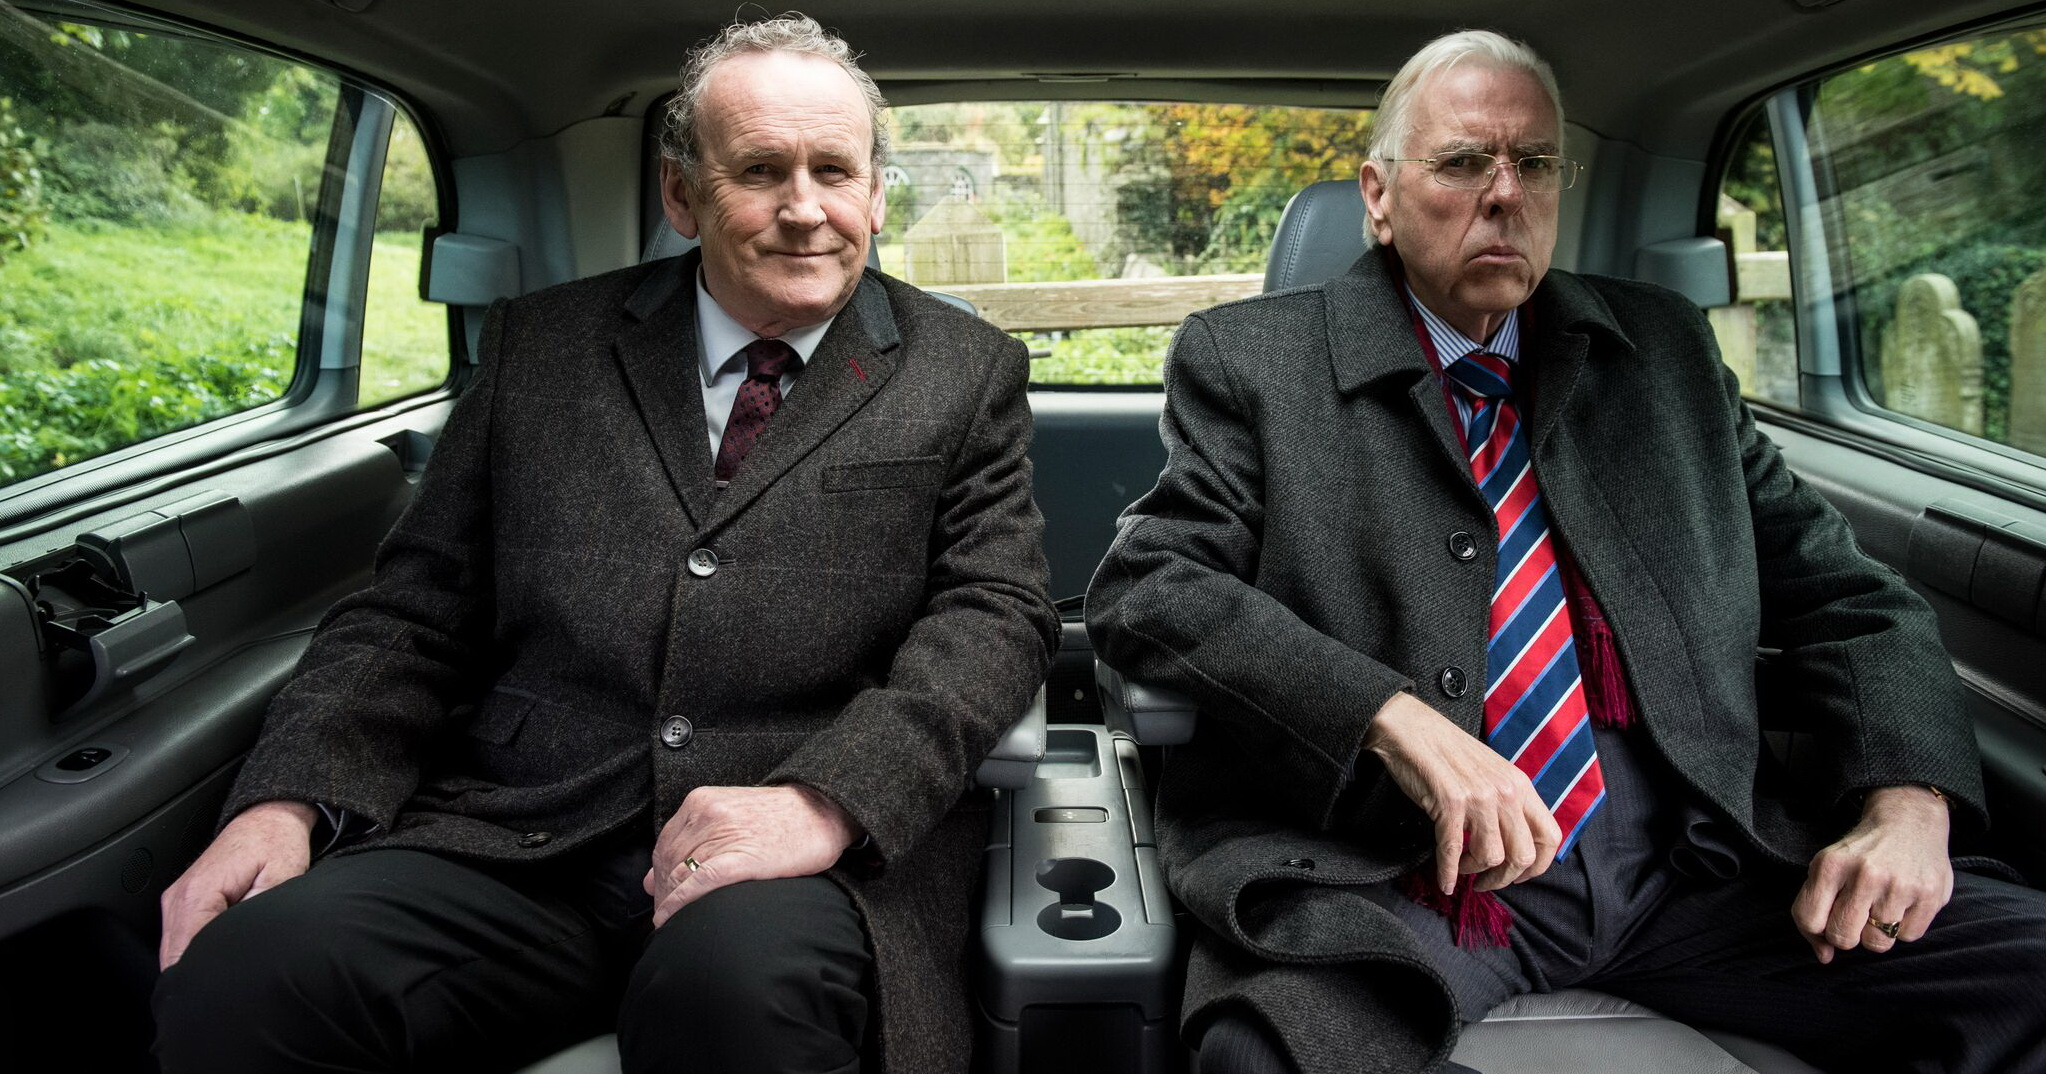 Il viaggio - The journey - Colm Meaney e Timothy Spall